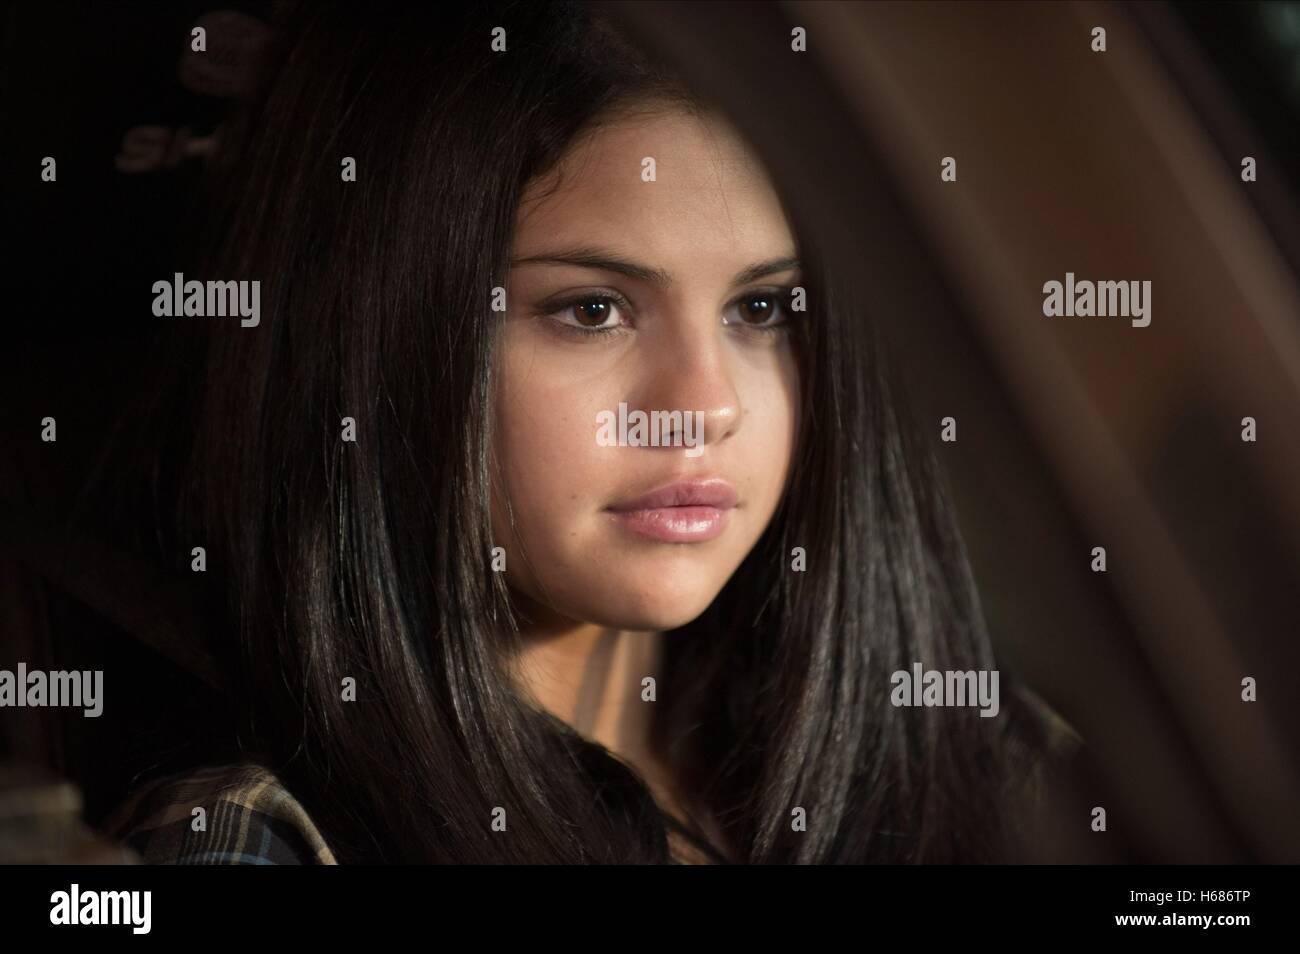 SELENA GOMEZ GETAWAY (2013) - Stock Image